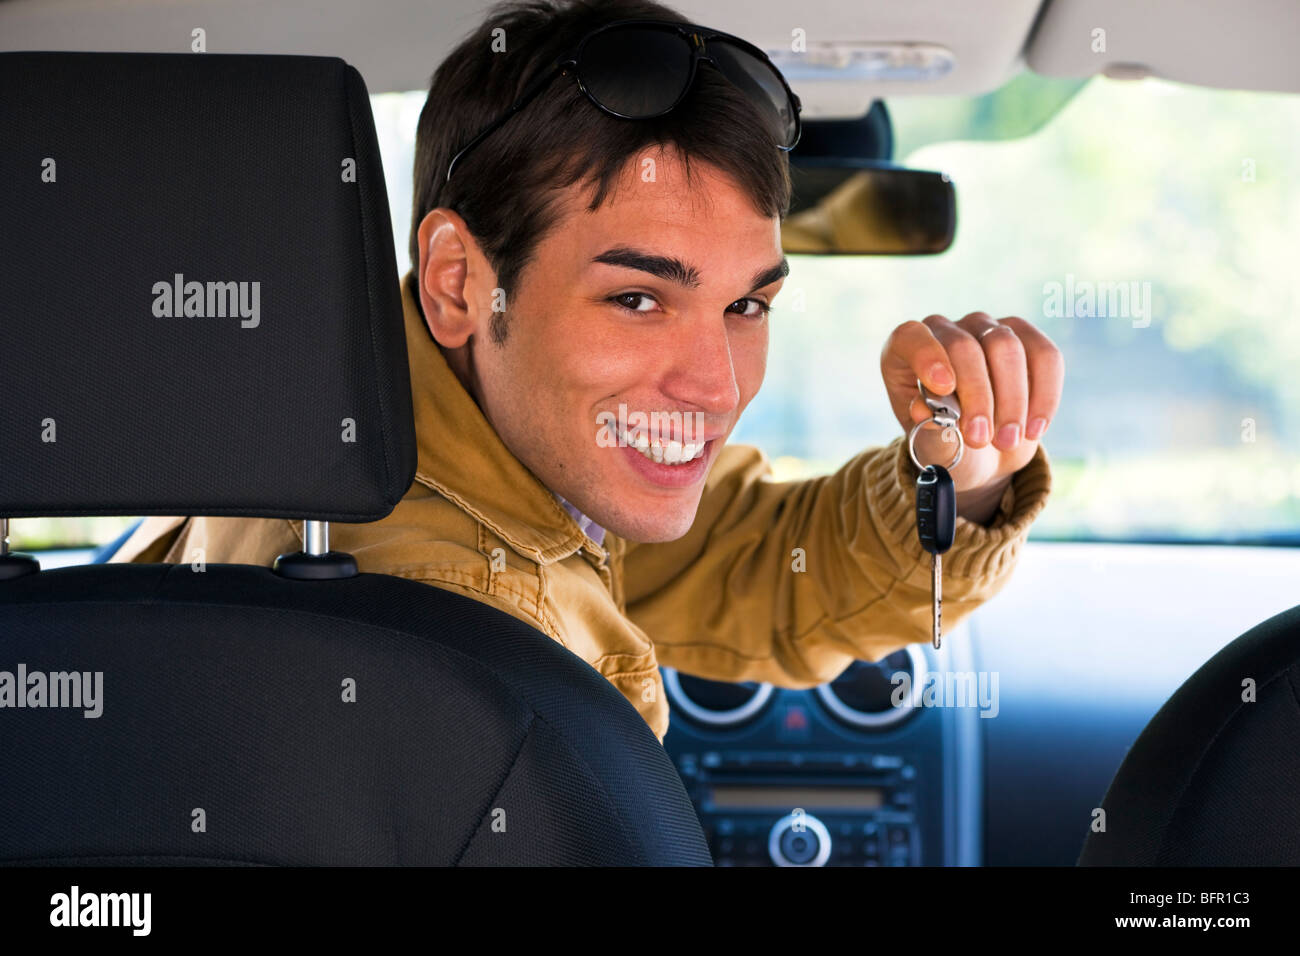 man in car showing car keys - Stock Image